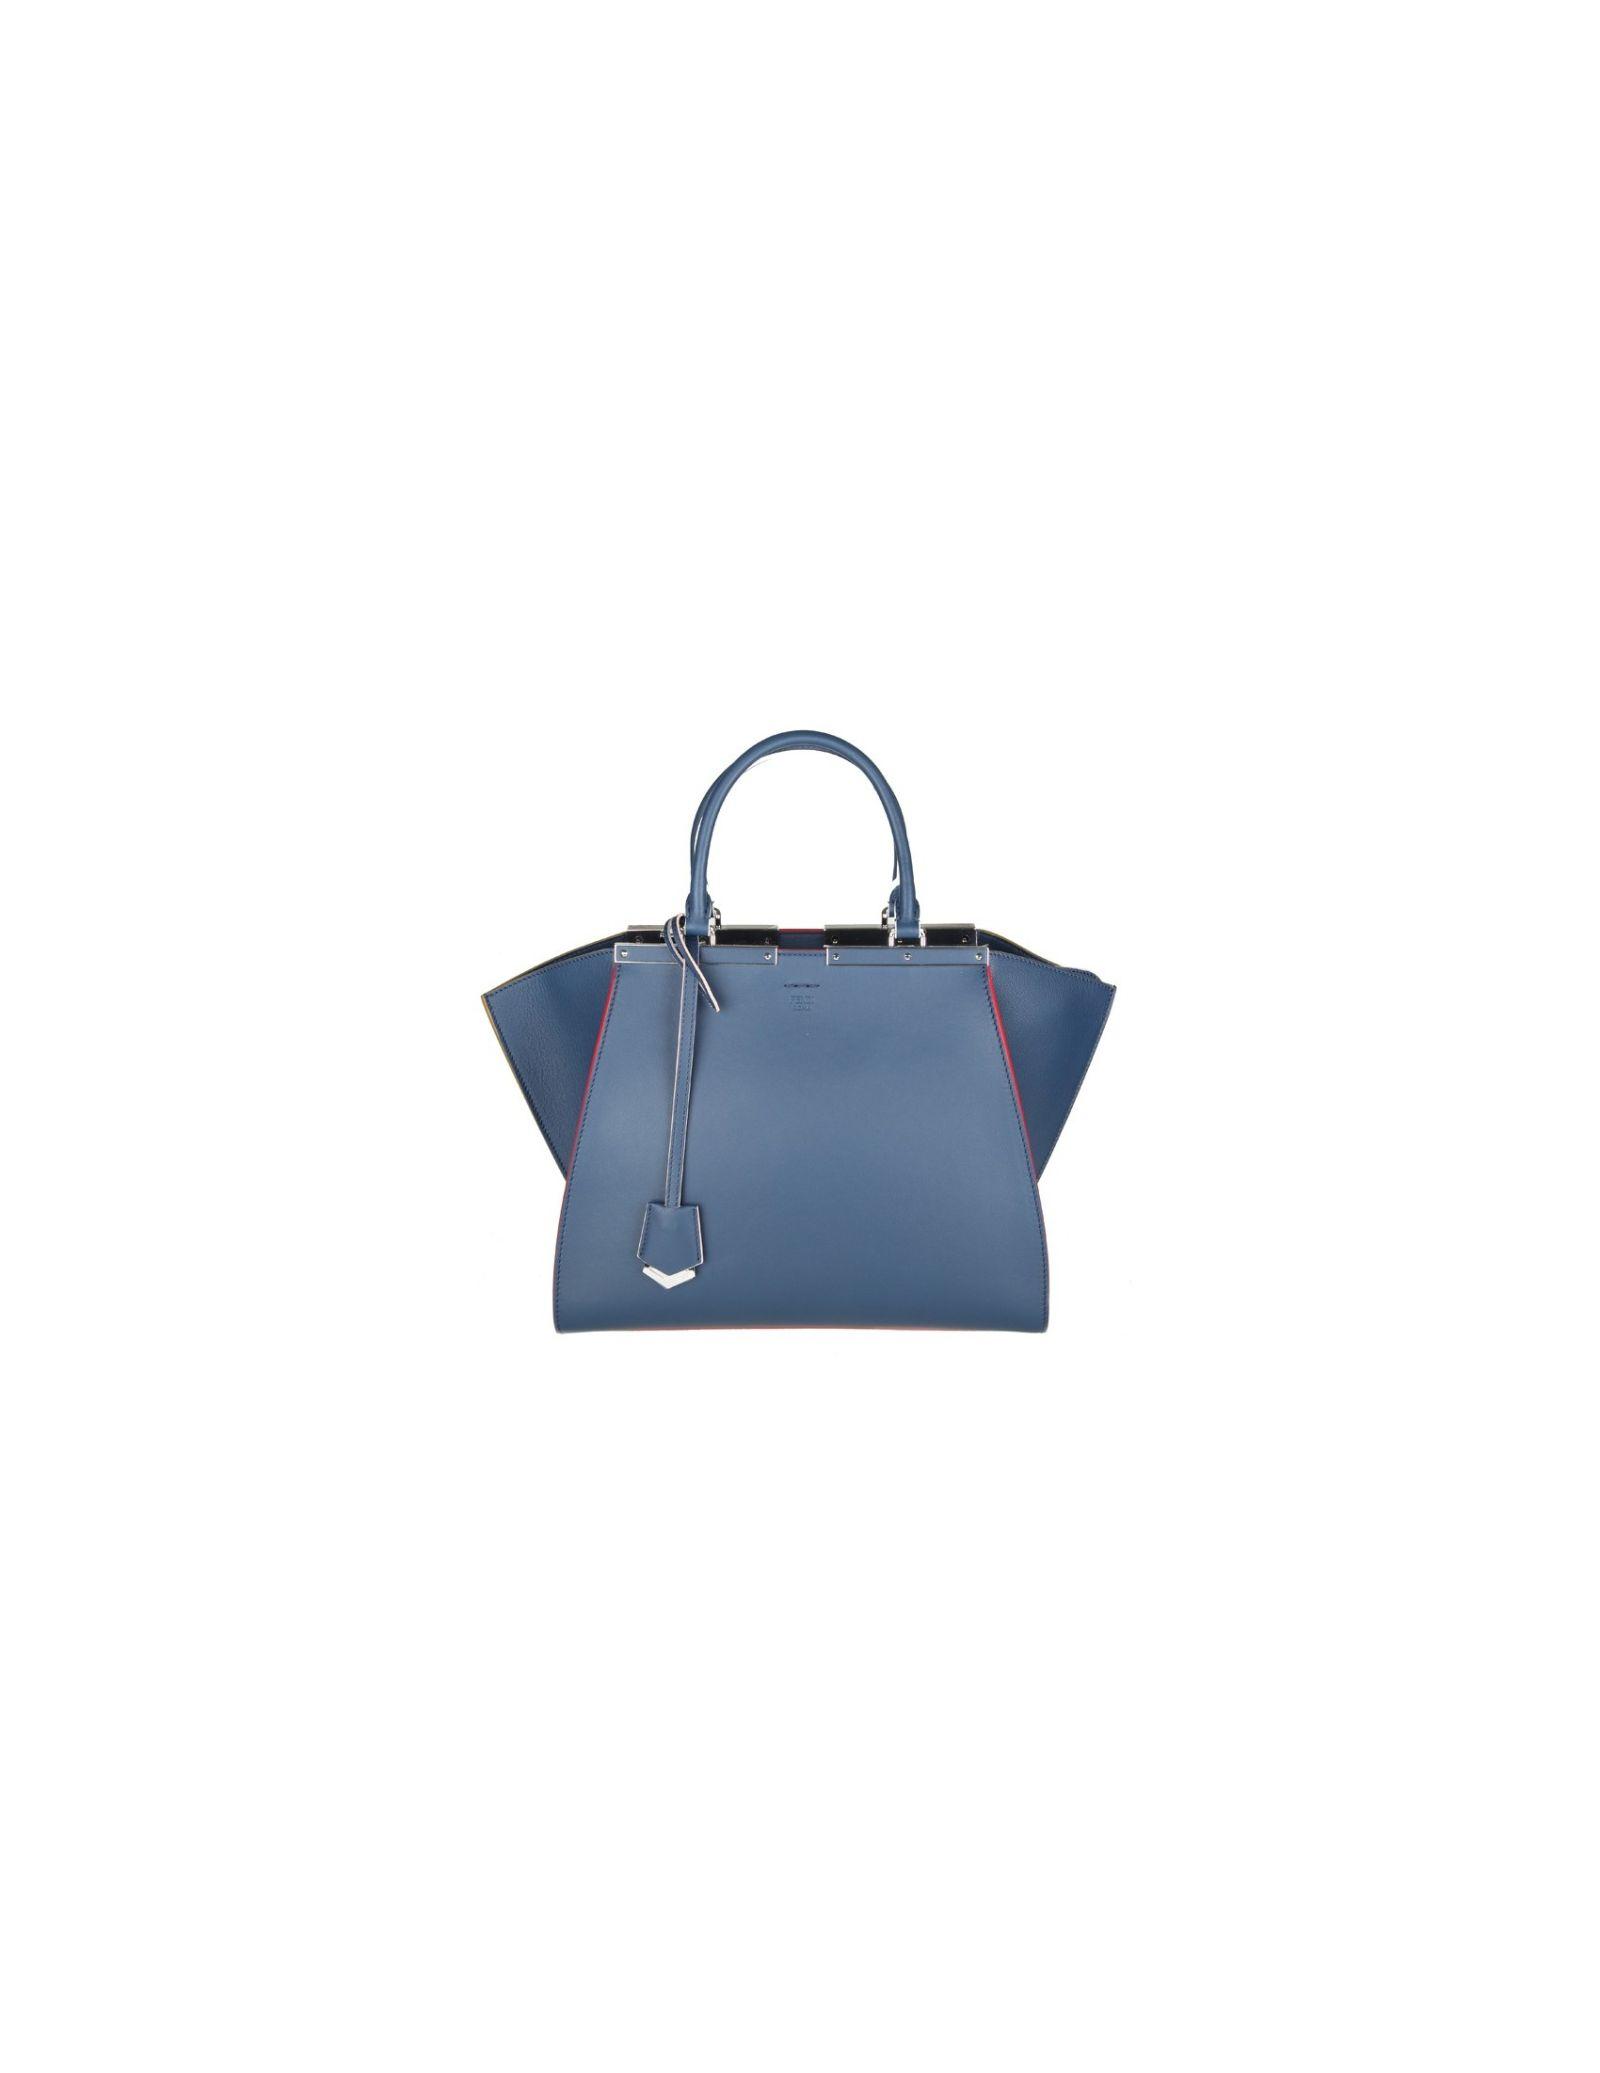 2d6e31f630 Fendi 3jour Shopping In Skin Color Blue - BLUE ...